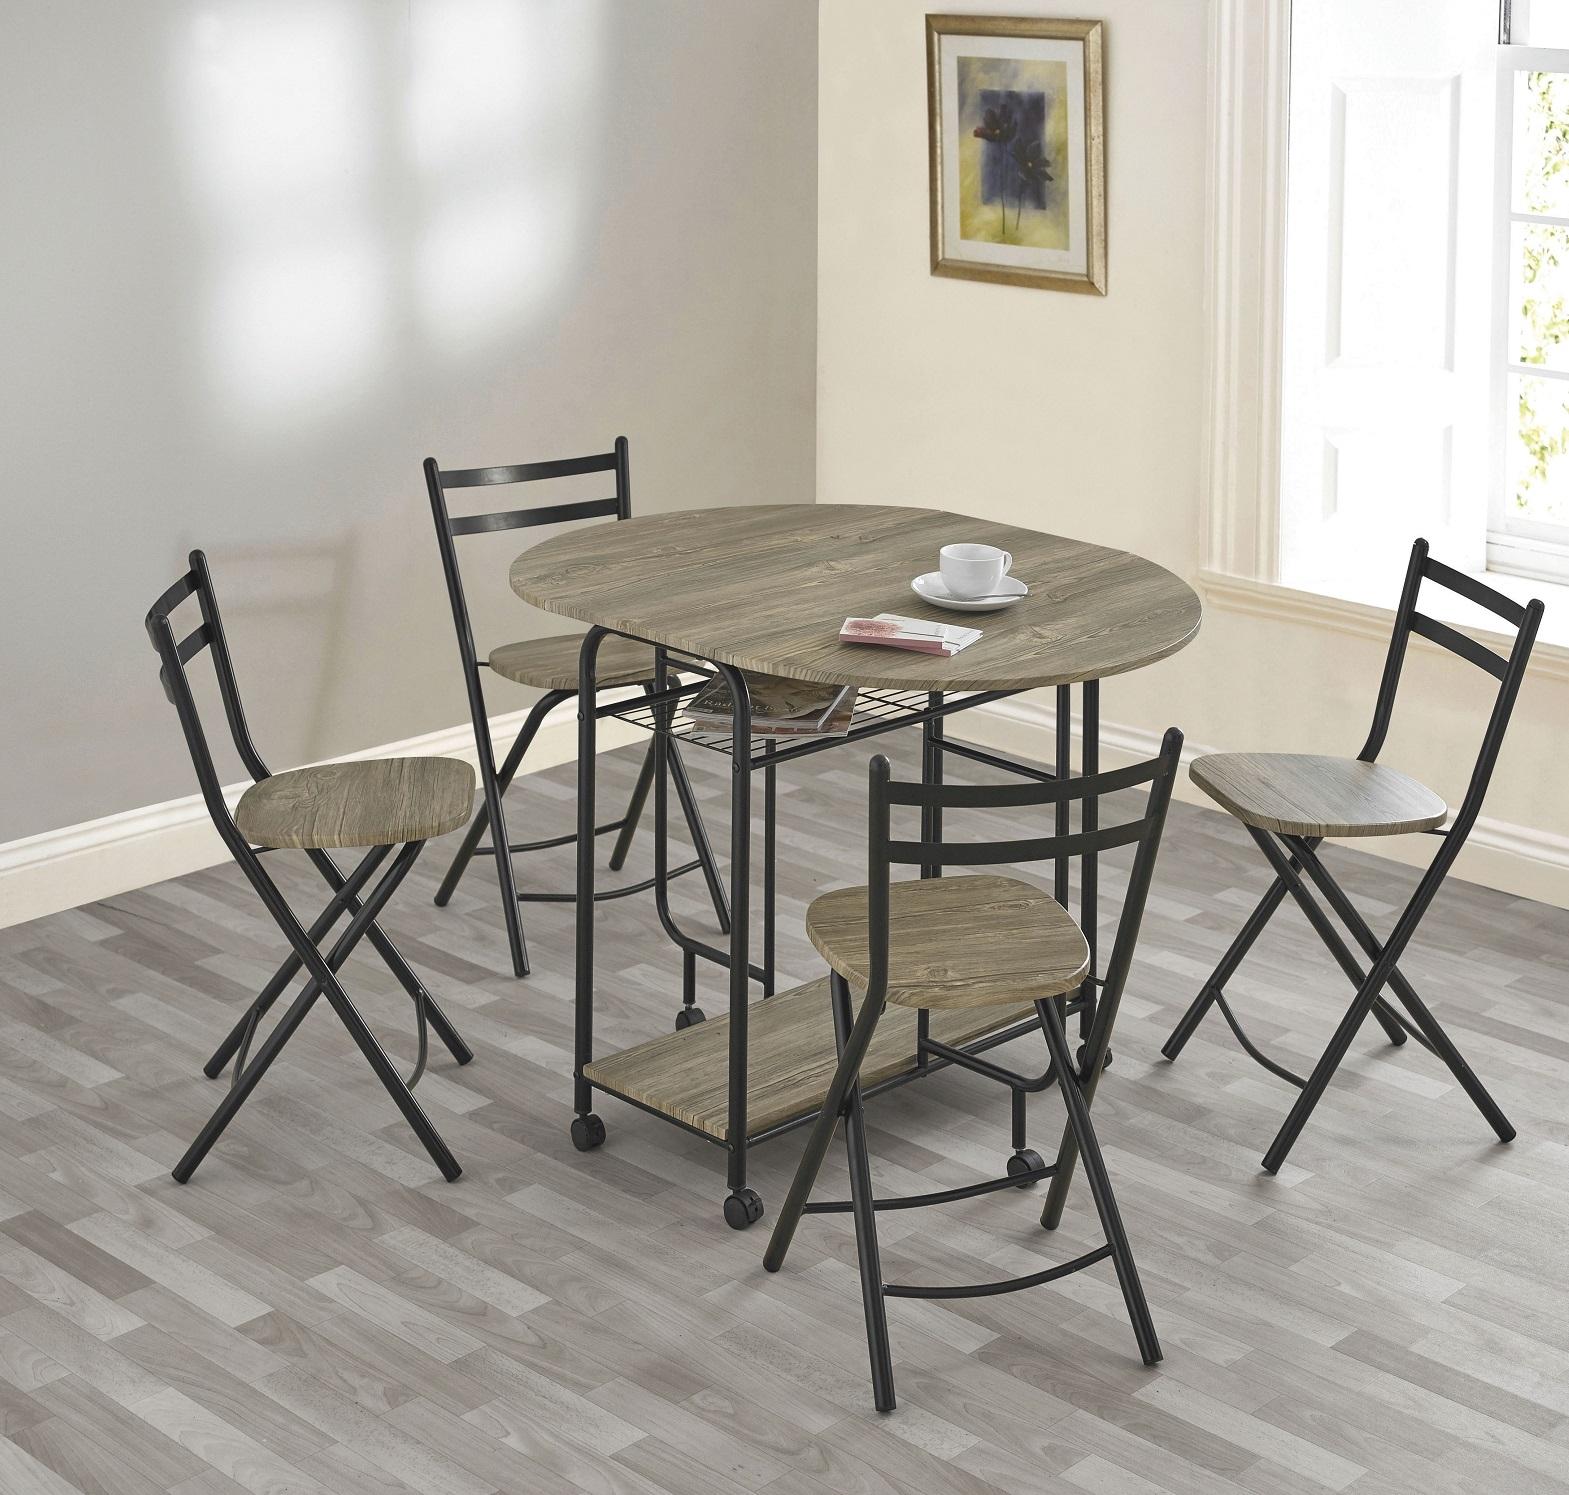 Image of Stowaway Dining Set (Grey / Black)